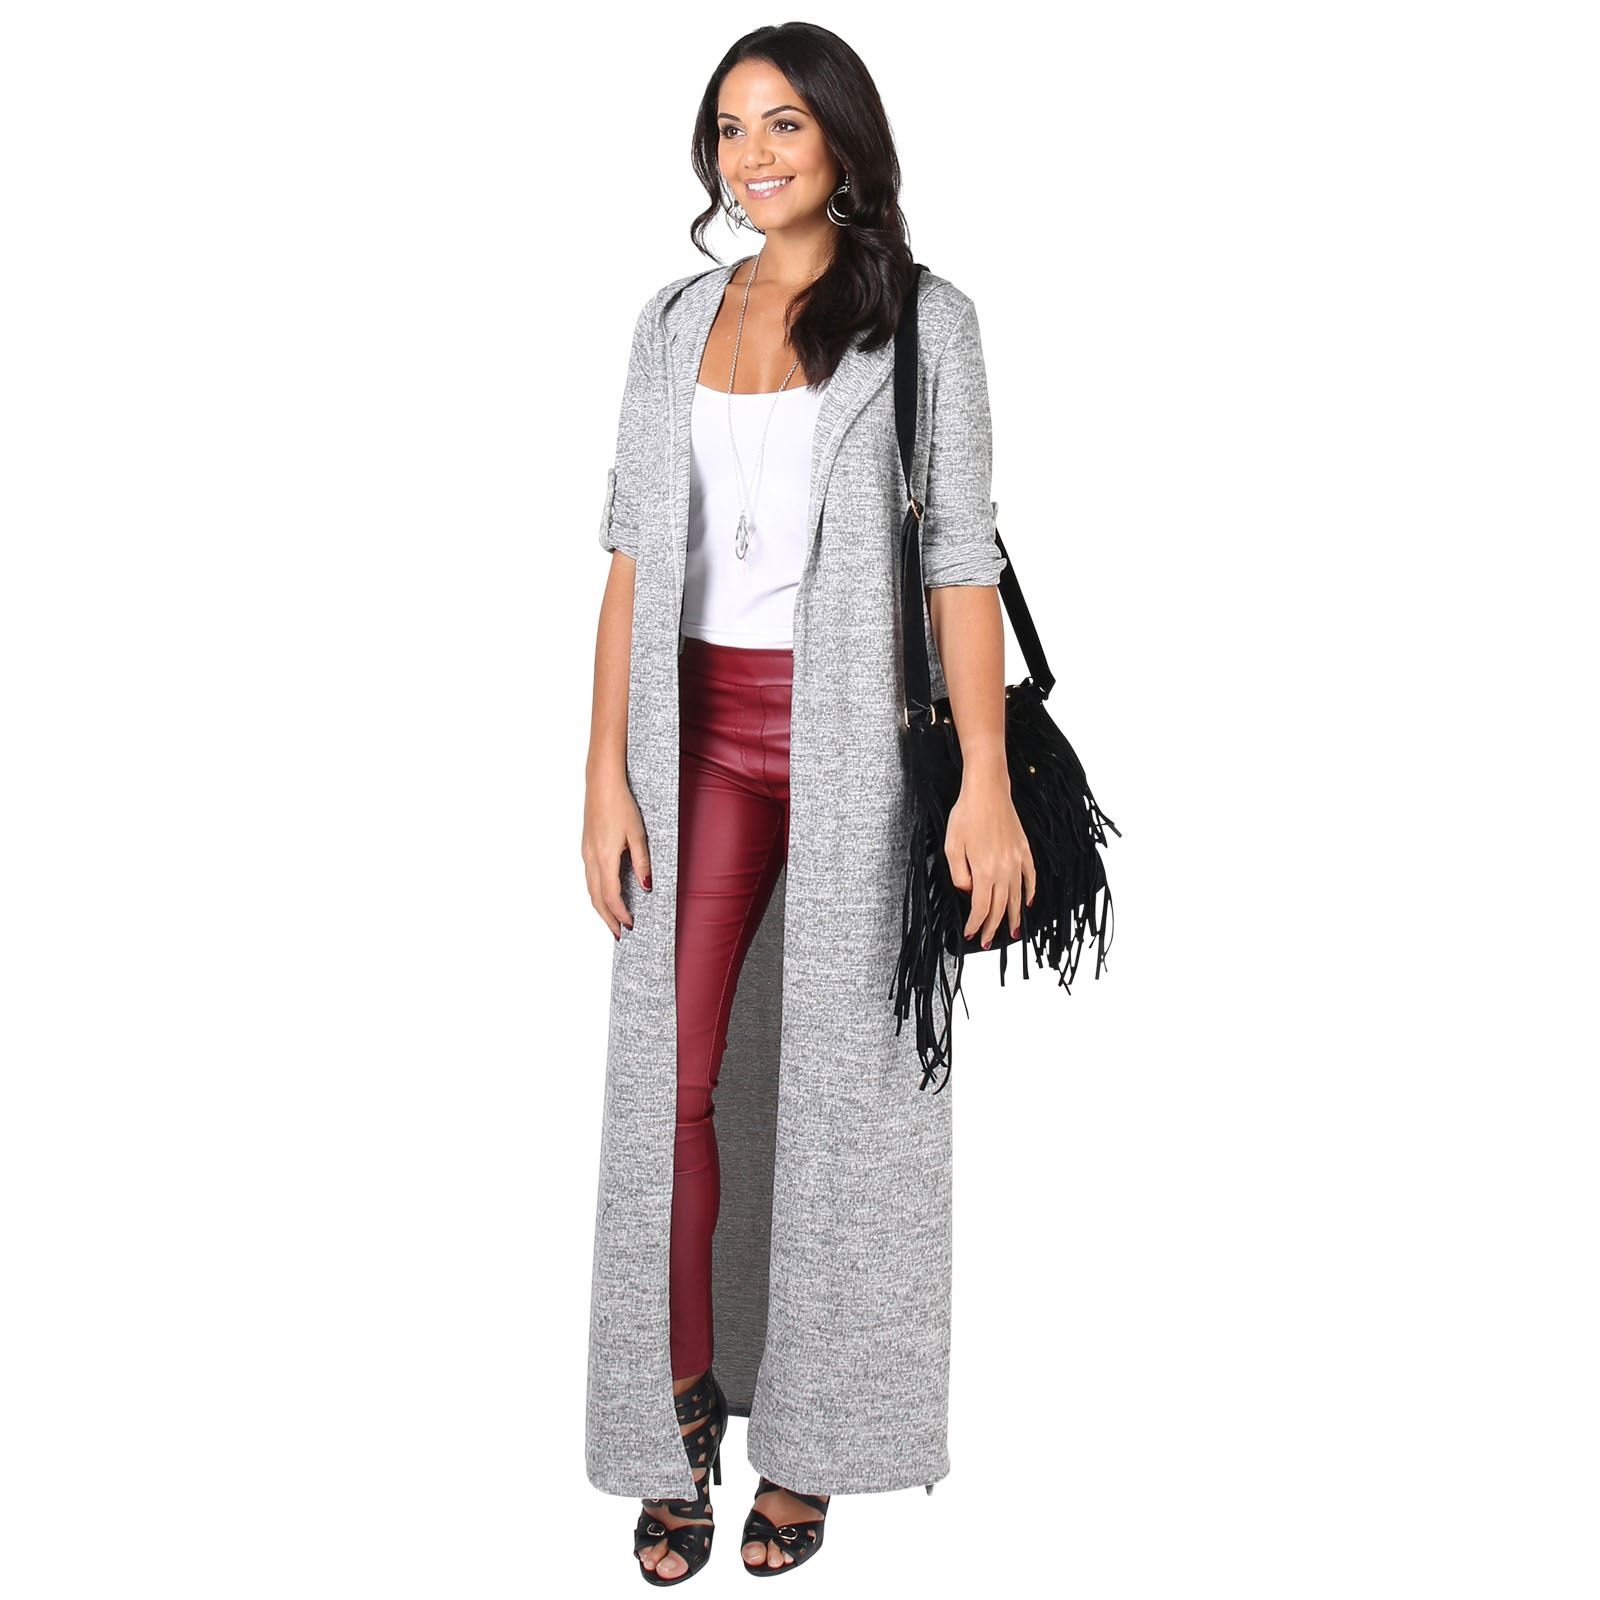 4b2a2d057270d Womens Soft Knit Hooded Long Cardigan Sweater Shrug Duster Coat US ...